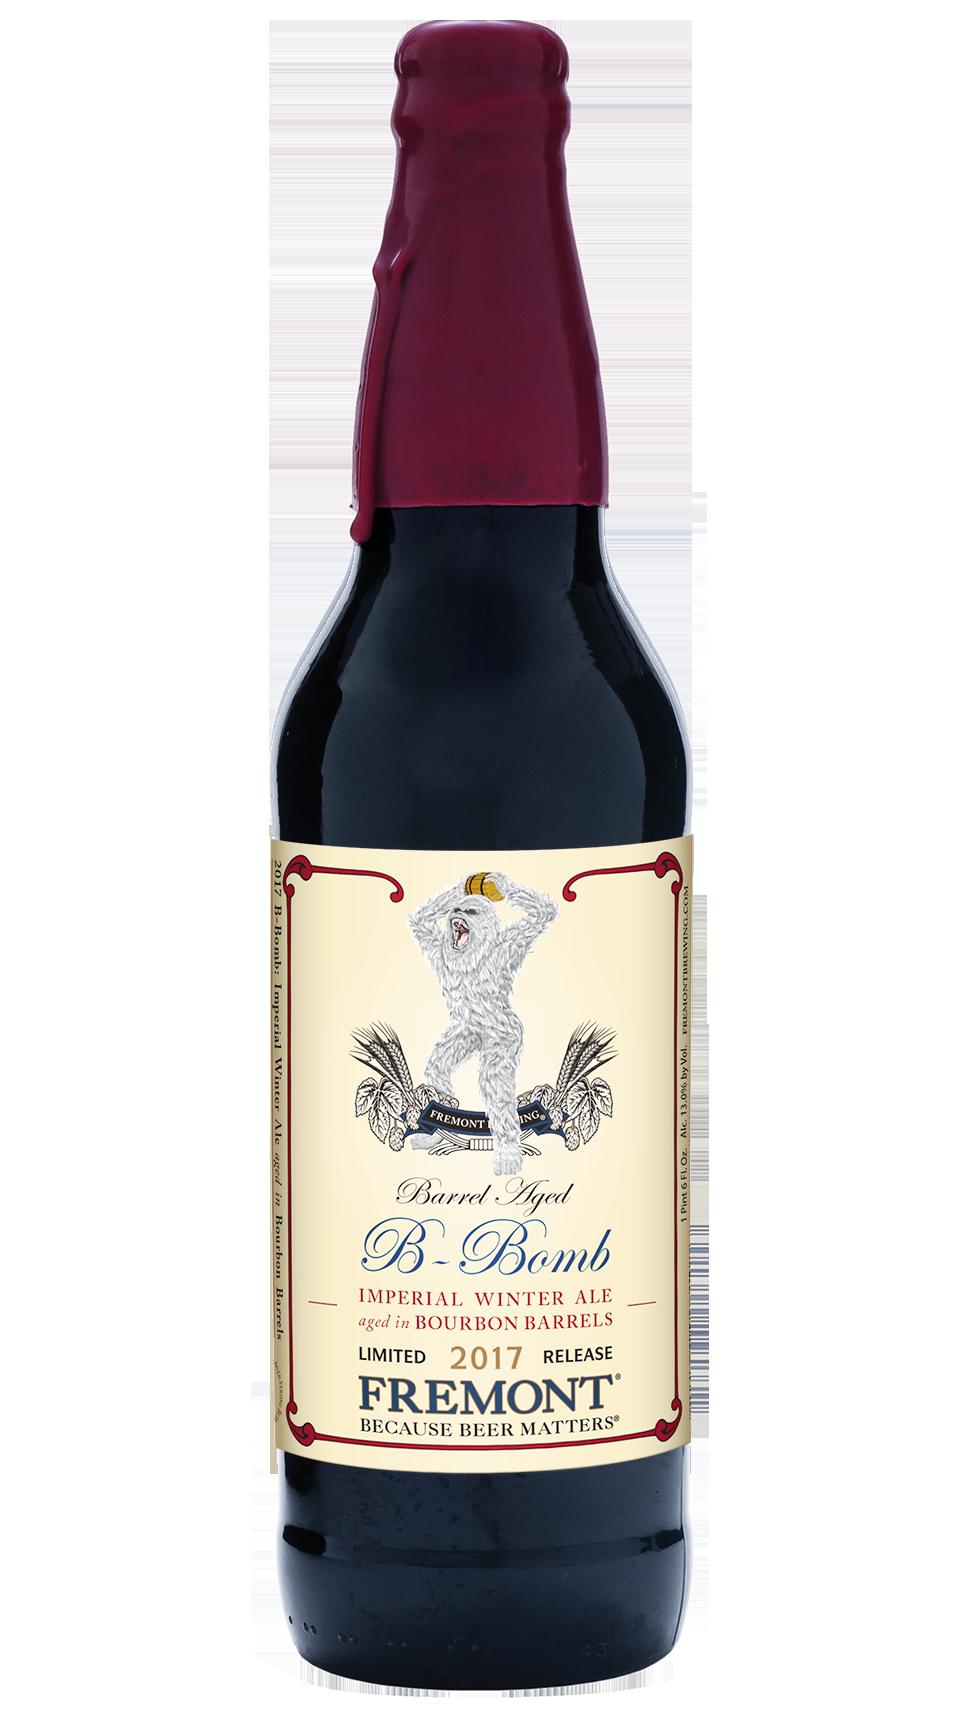 Hops clipart vine. Our beer fremont brewing